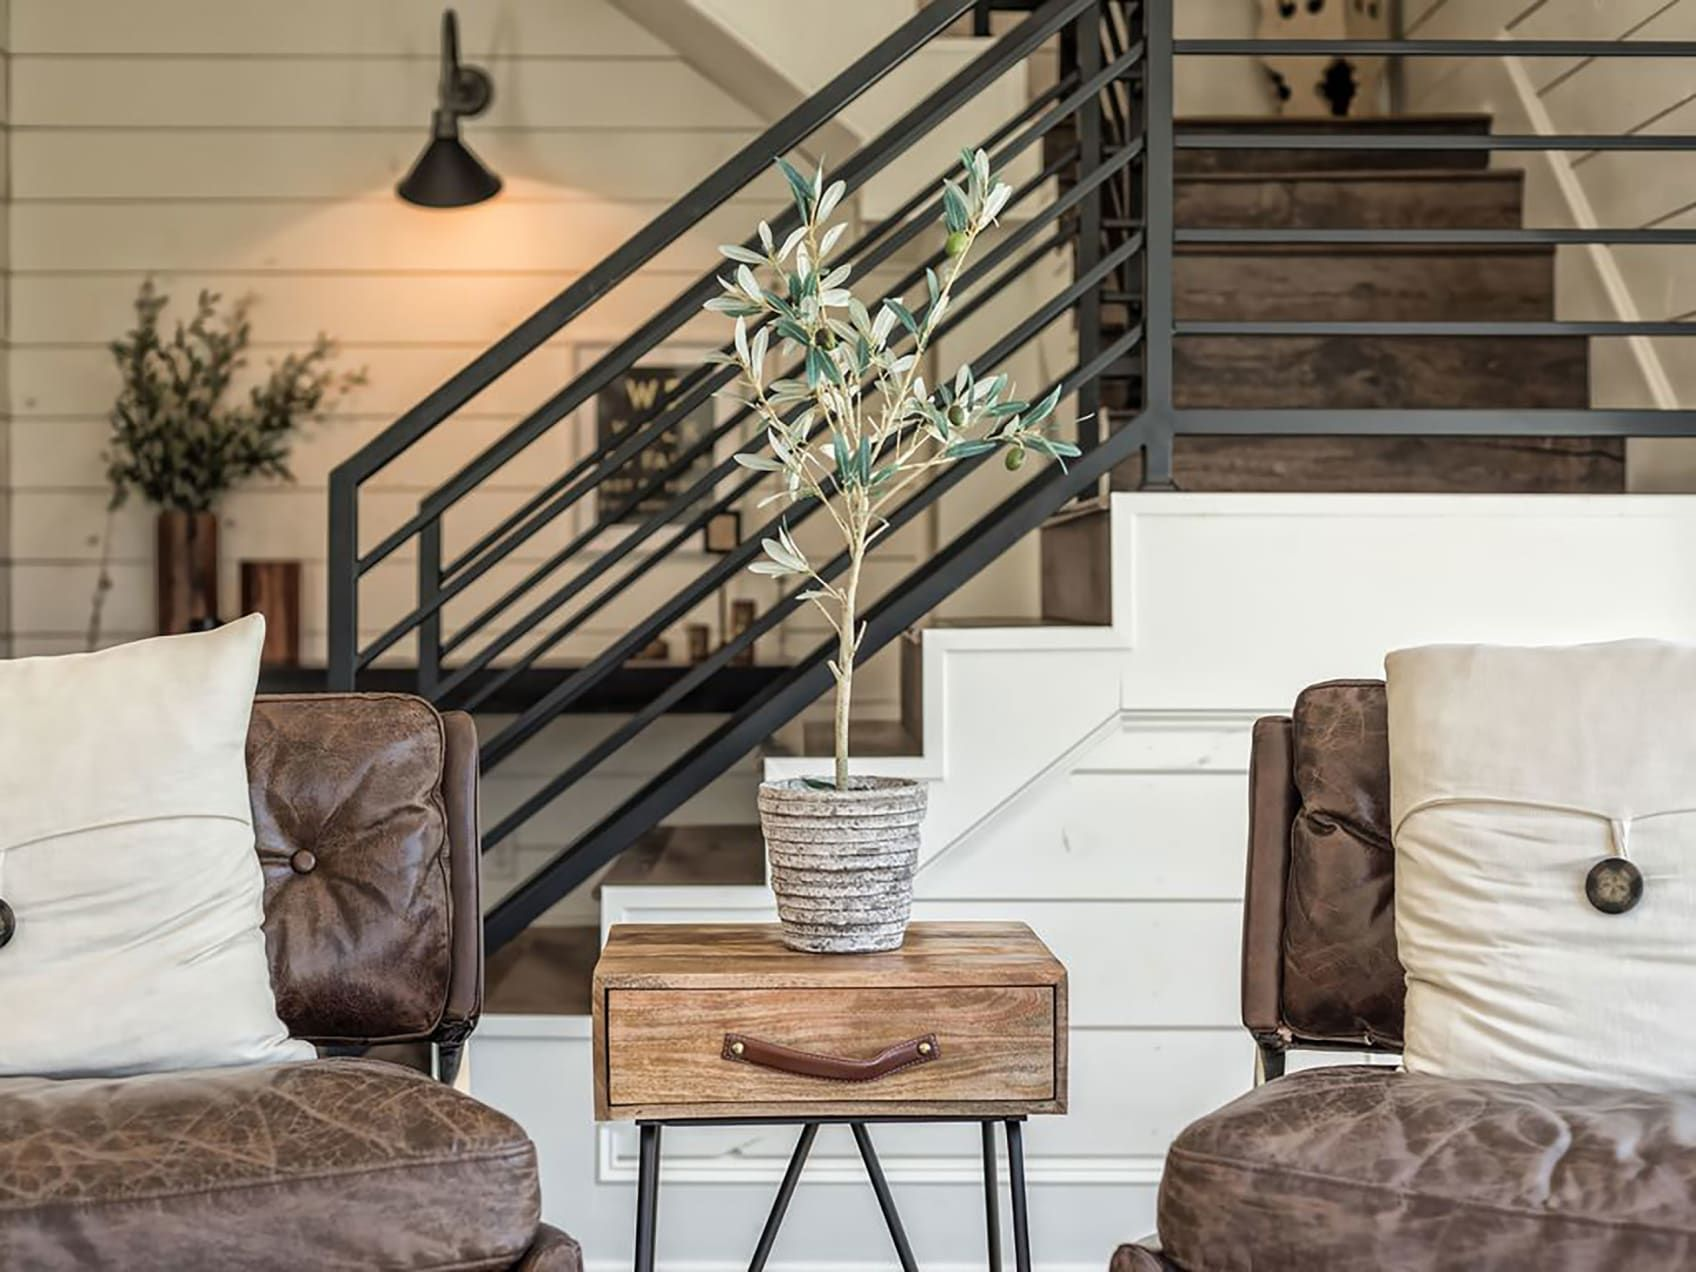 OMG, I Want This House: The 'Fixer Upper' Barndominium (Photos)